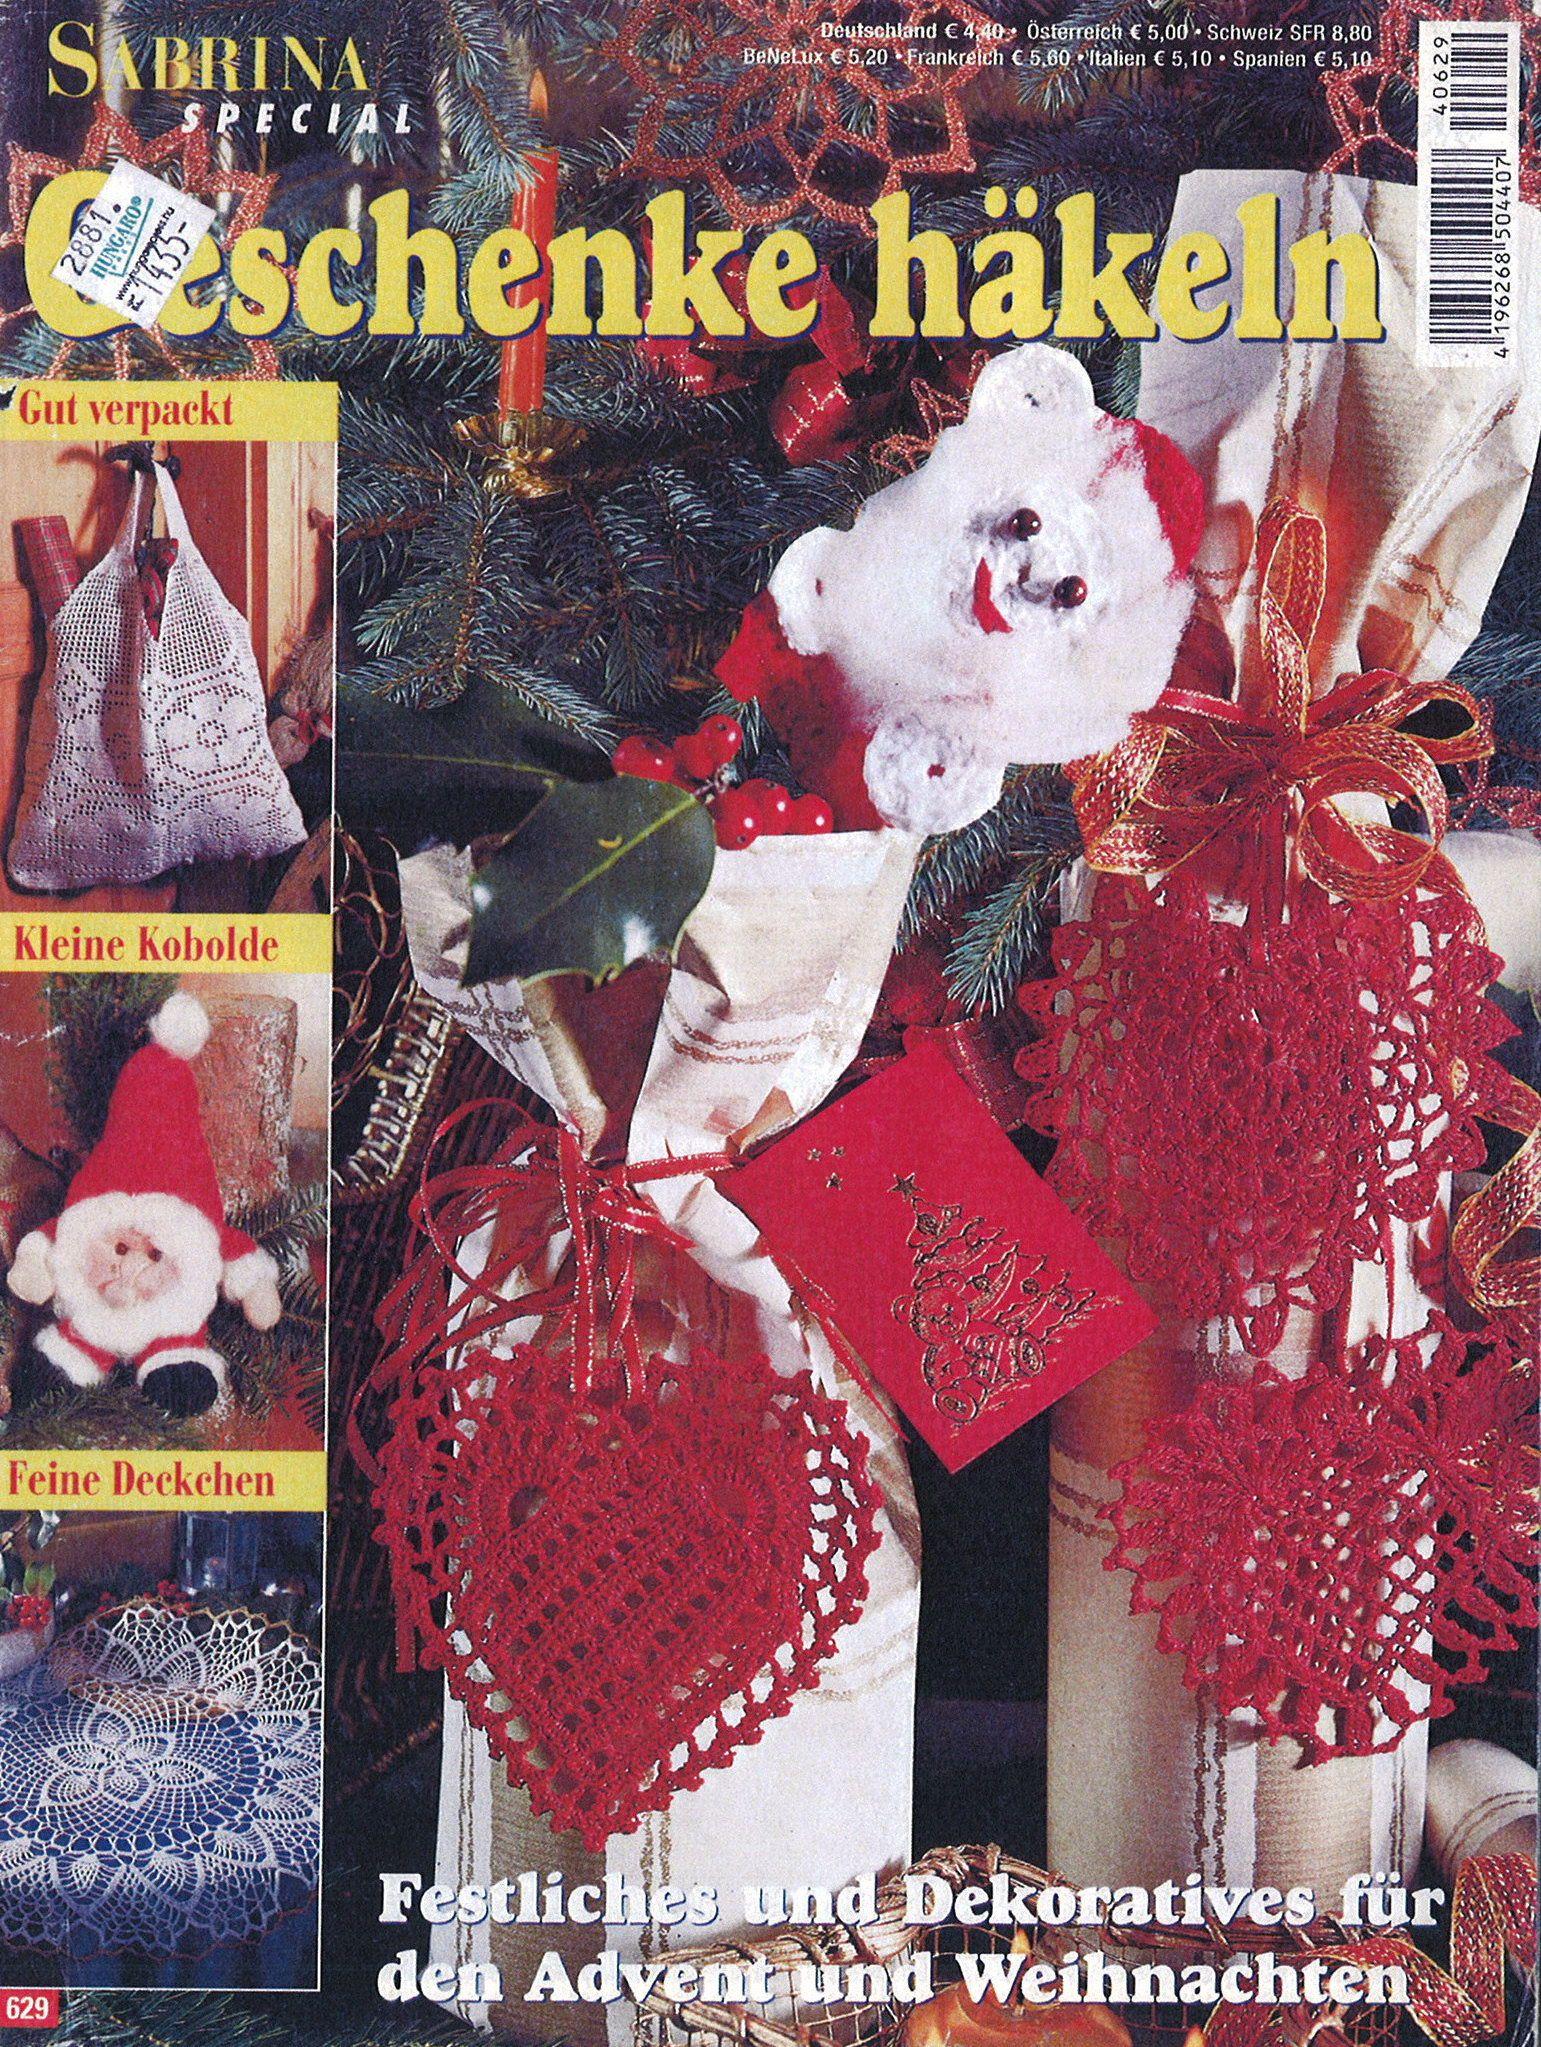 Sabrina Special: Geschenke Hakeln S629 2004